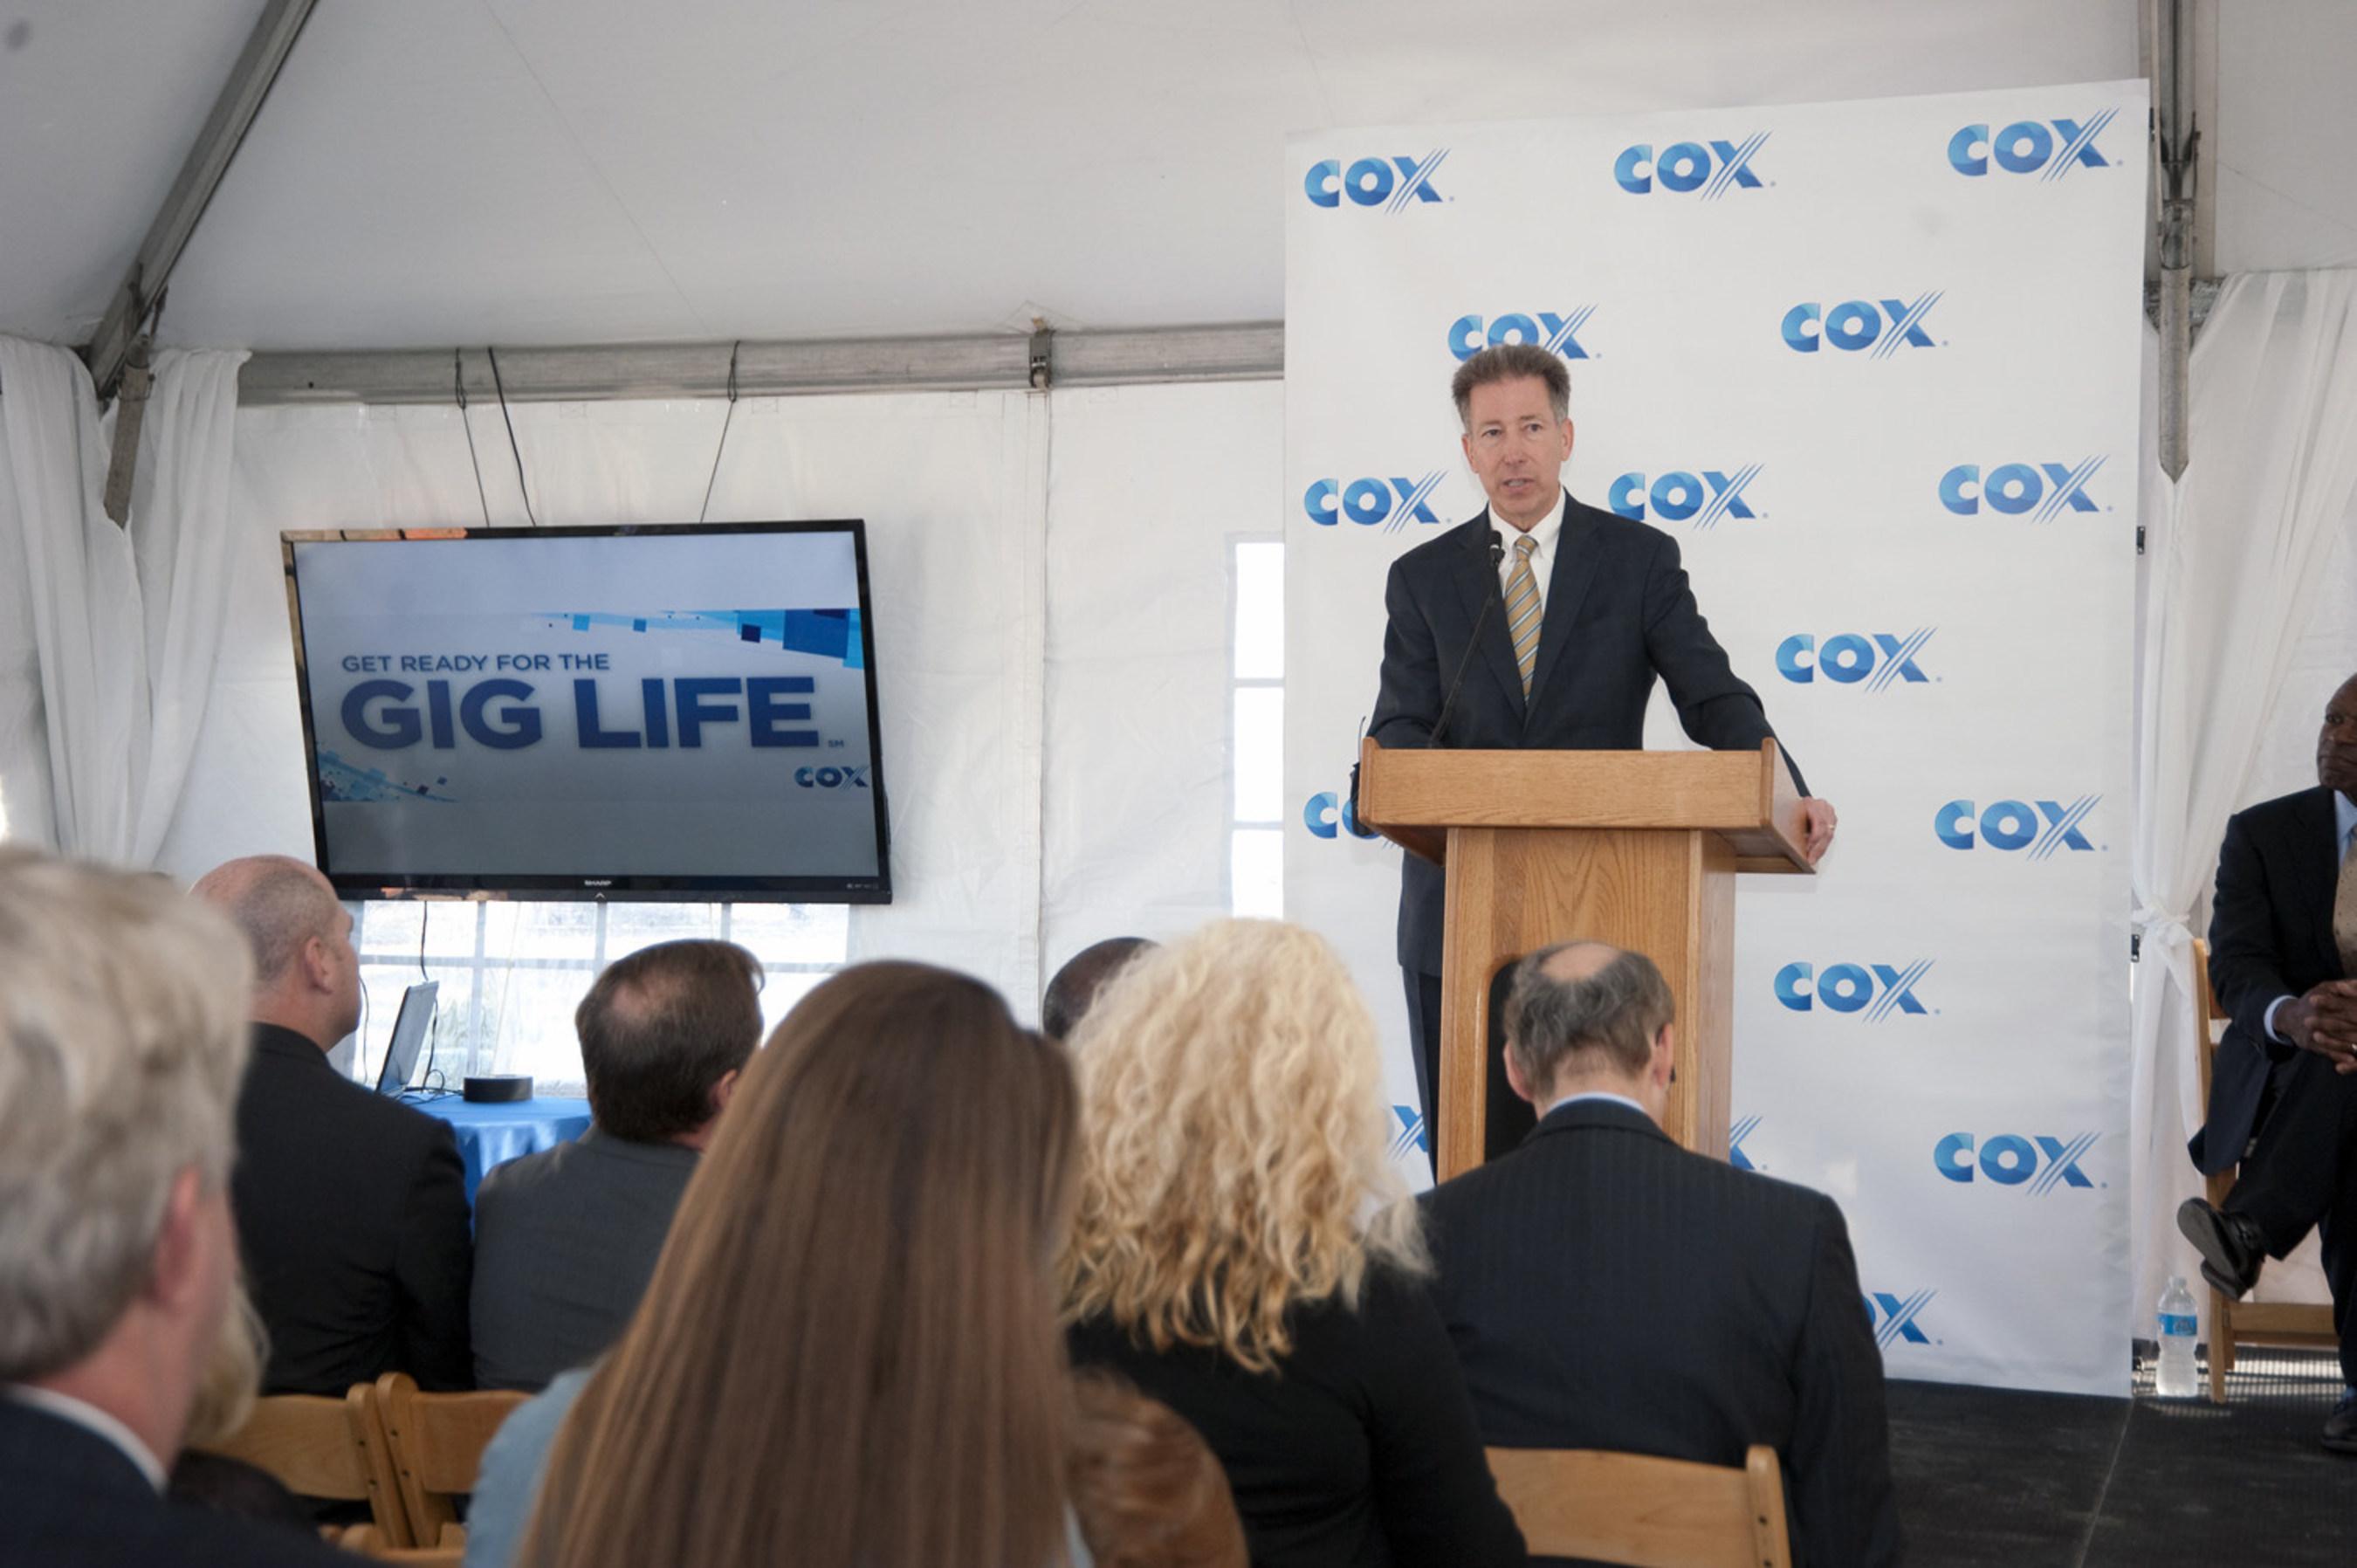 Cox Communications President Pat Esser announces first Virginia development to get Gigabit internet speeds  - Viridian Reserve at Hickory in Chesapeake.